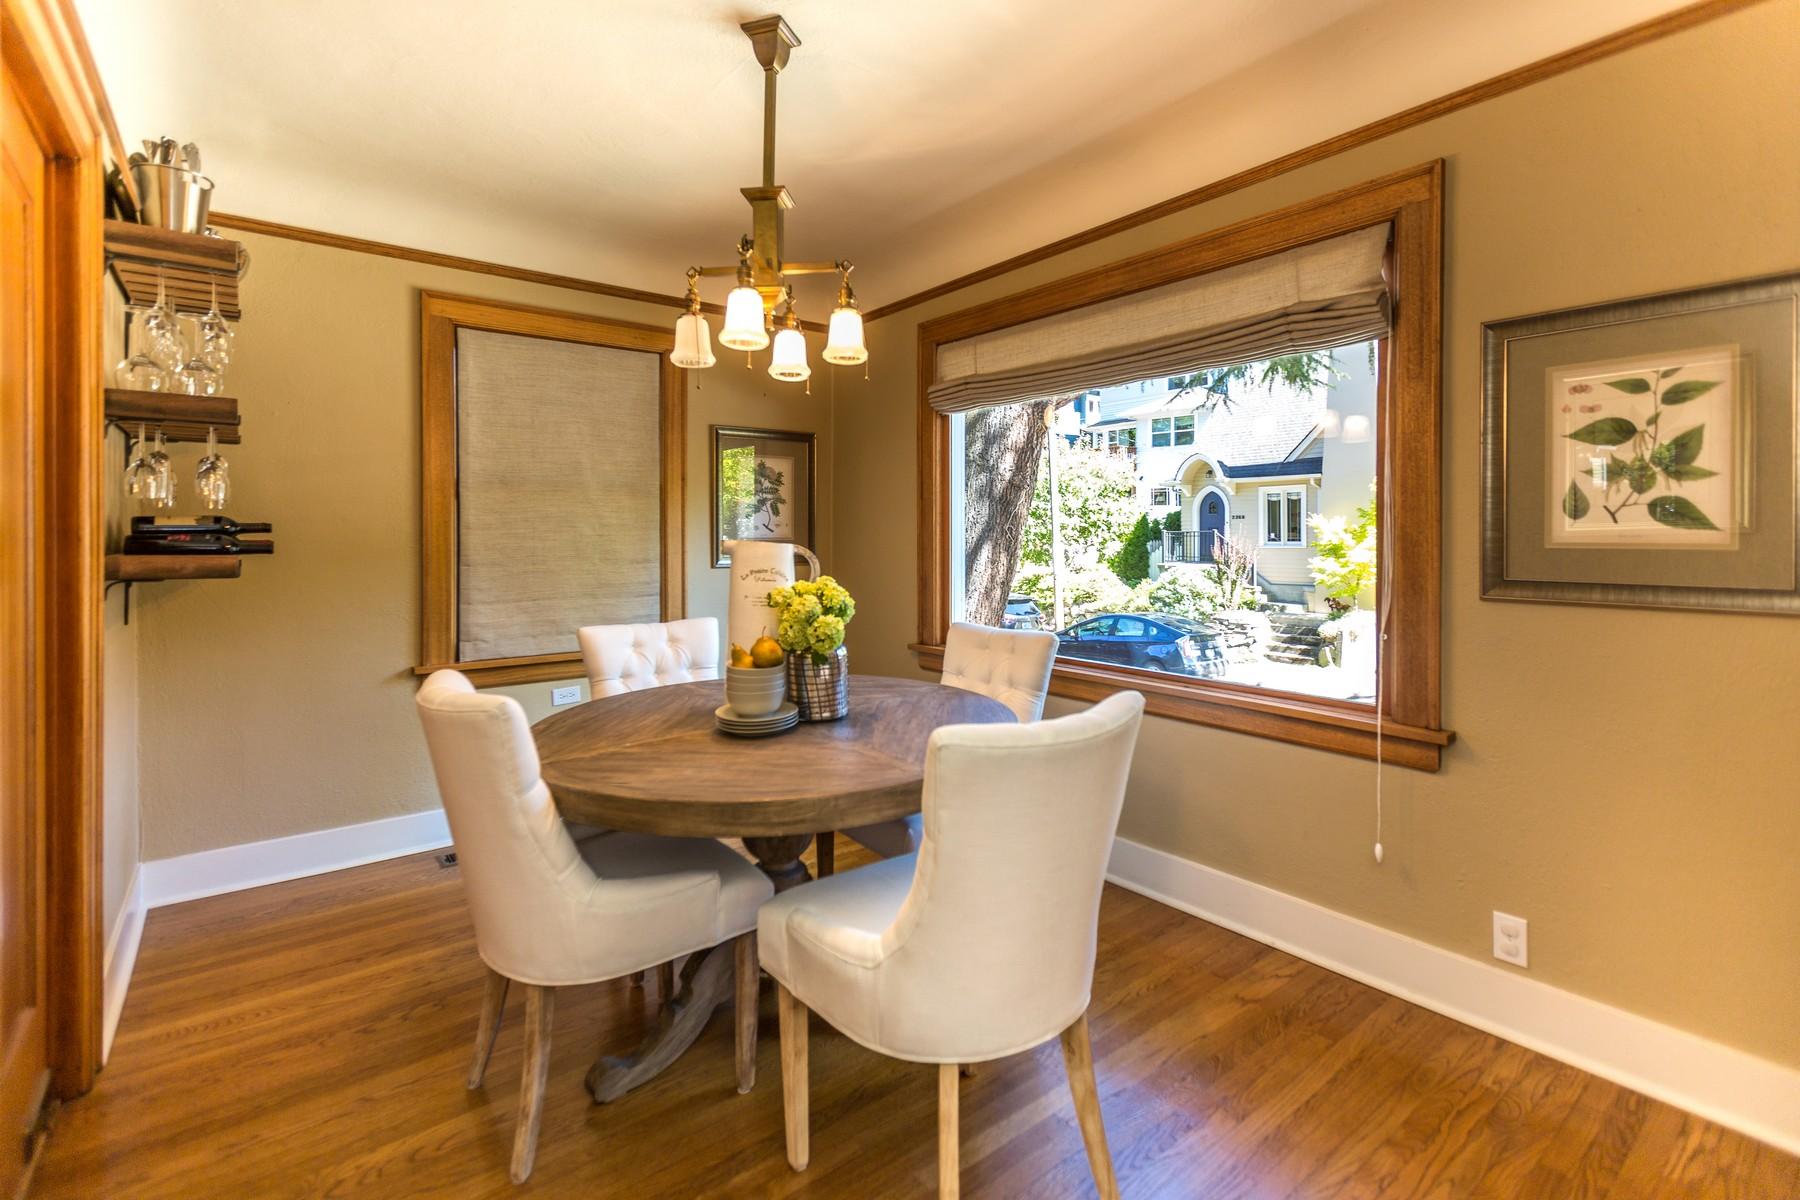 Additional photo for property listing at Classic Montlake Tudor 2271 E Howe St Seattle, Вашингтон 98112 Соединенные Штаты